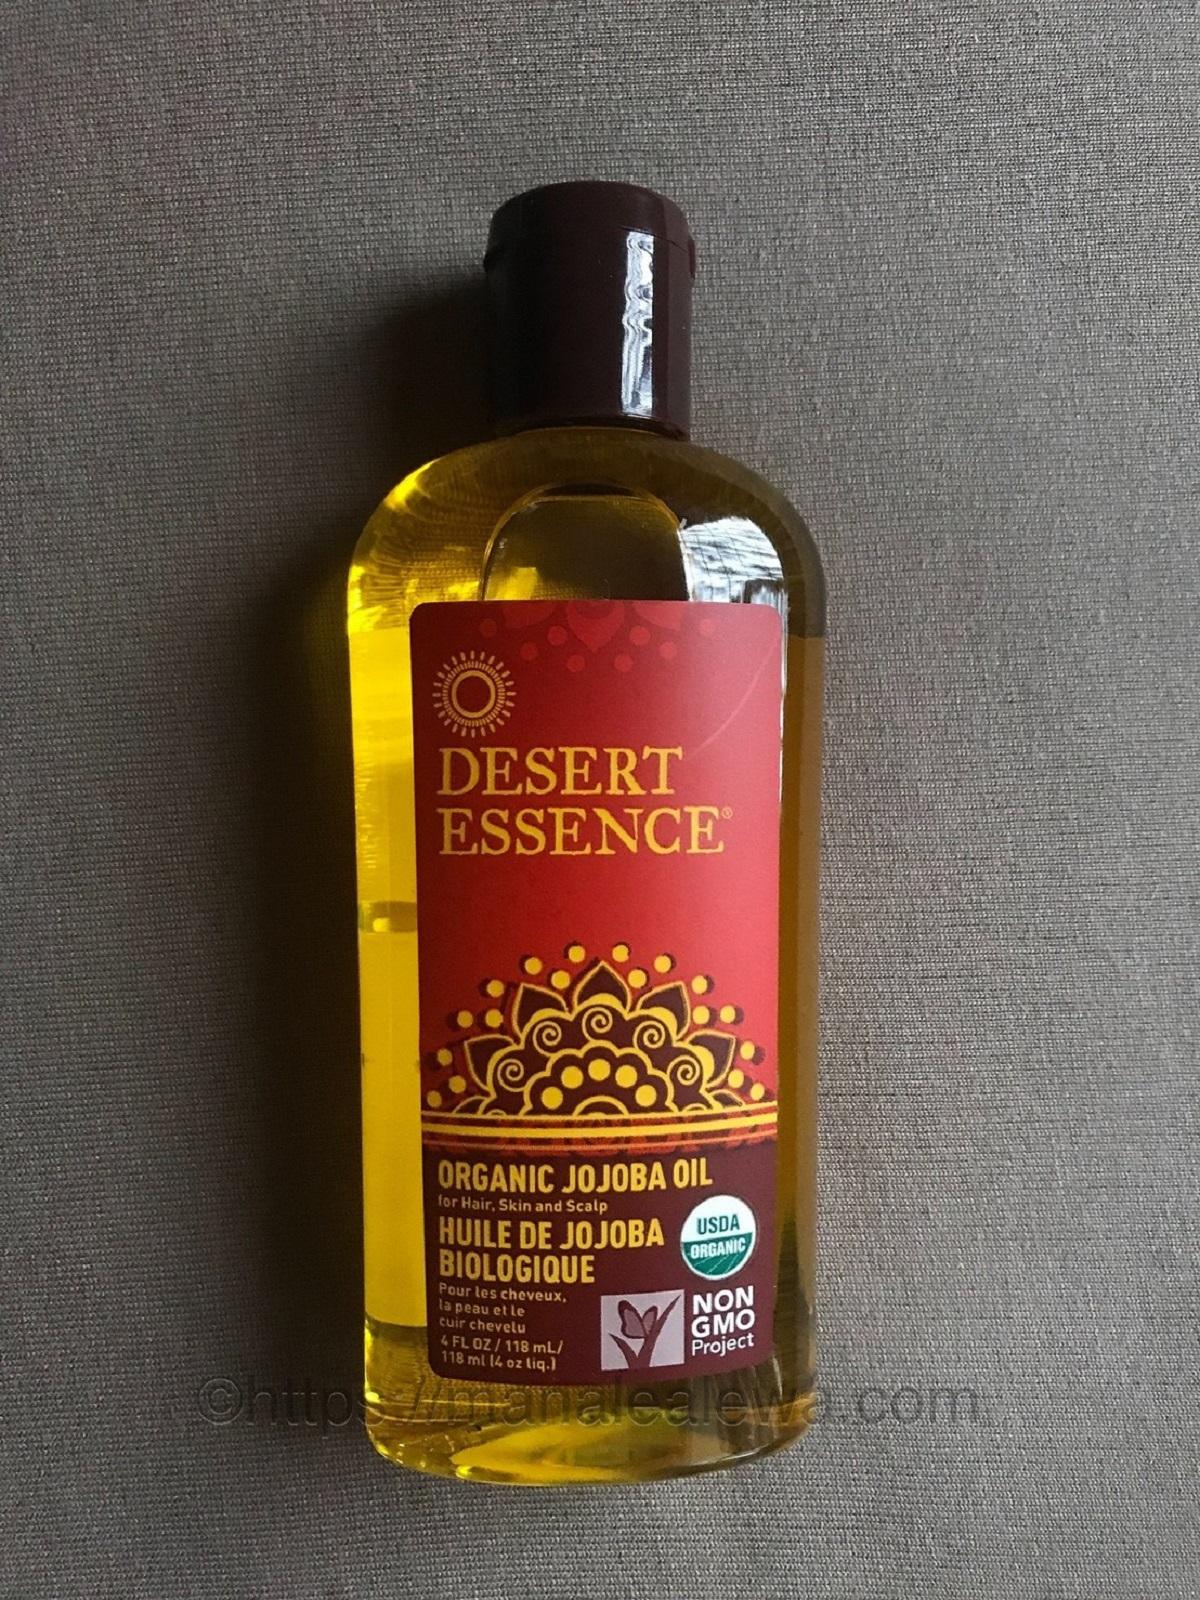 desert-essence-organic-jojoba-oil